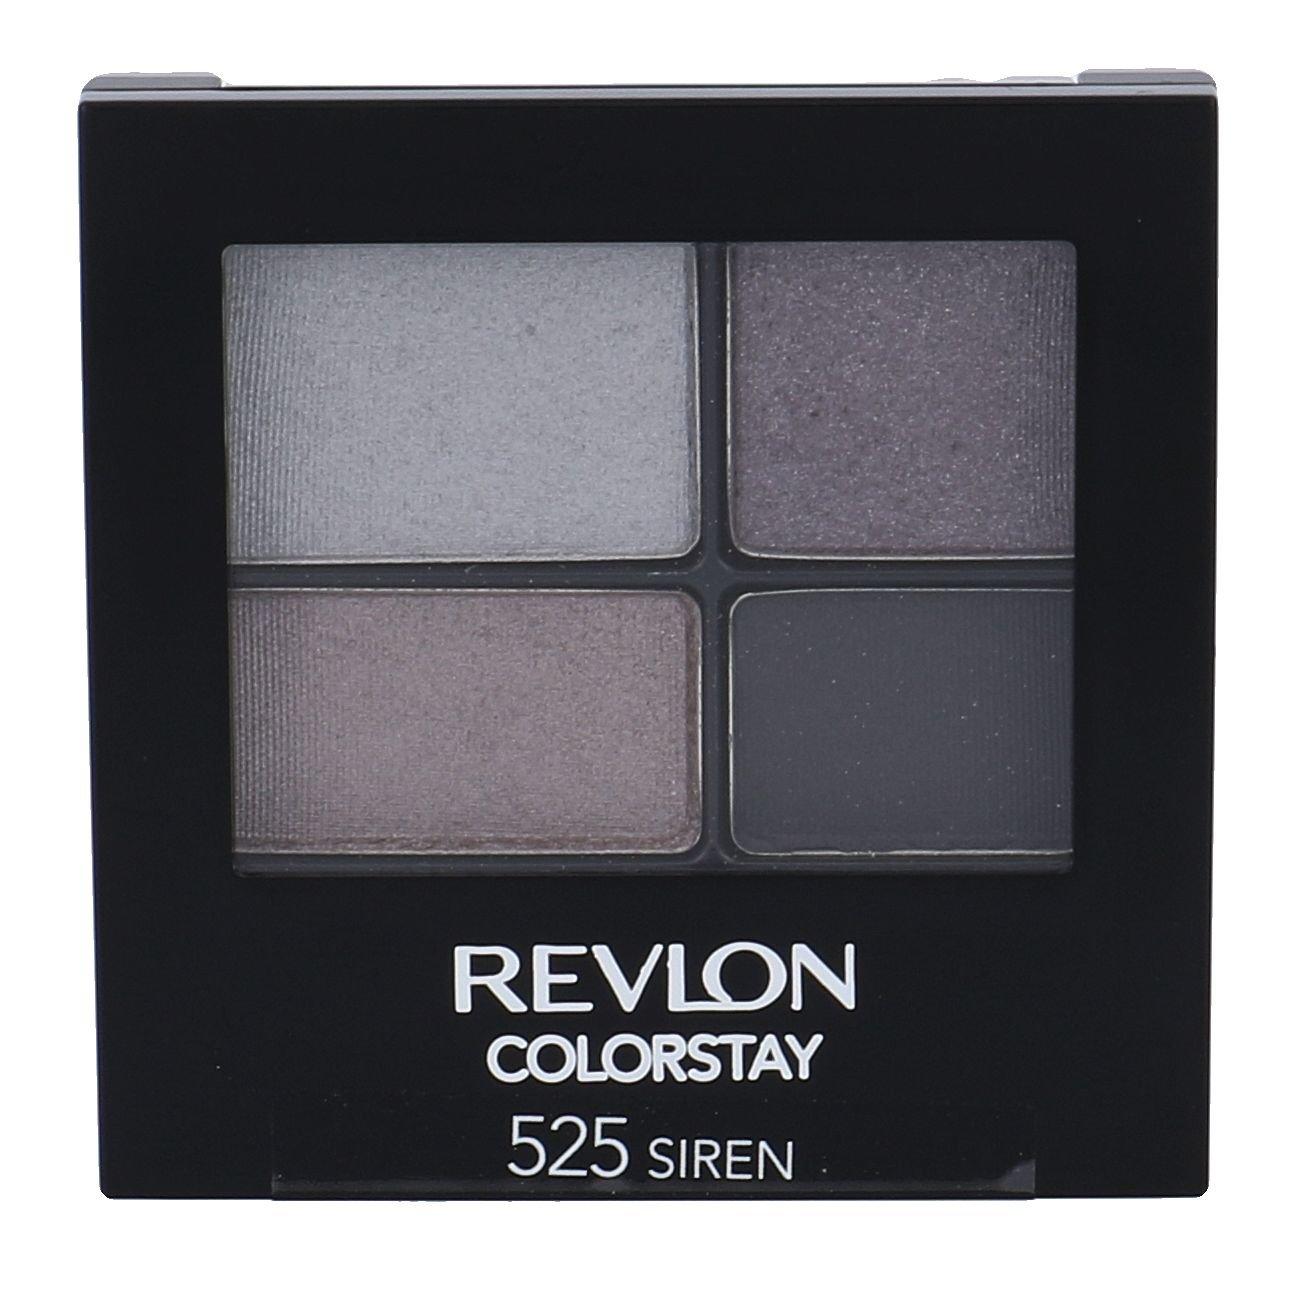 Revlon Colorstay Cosmetic 4,8ml 525 Siren